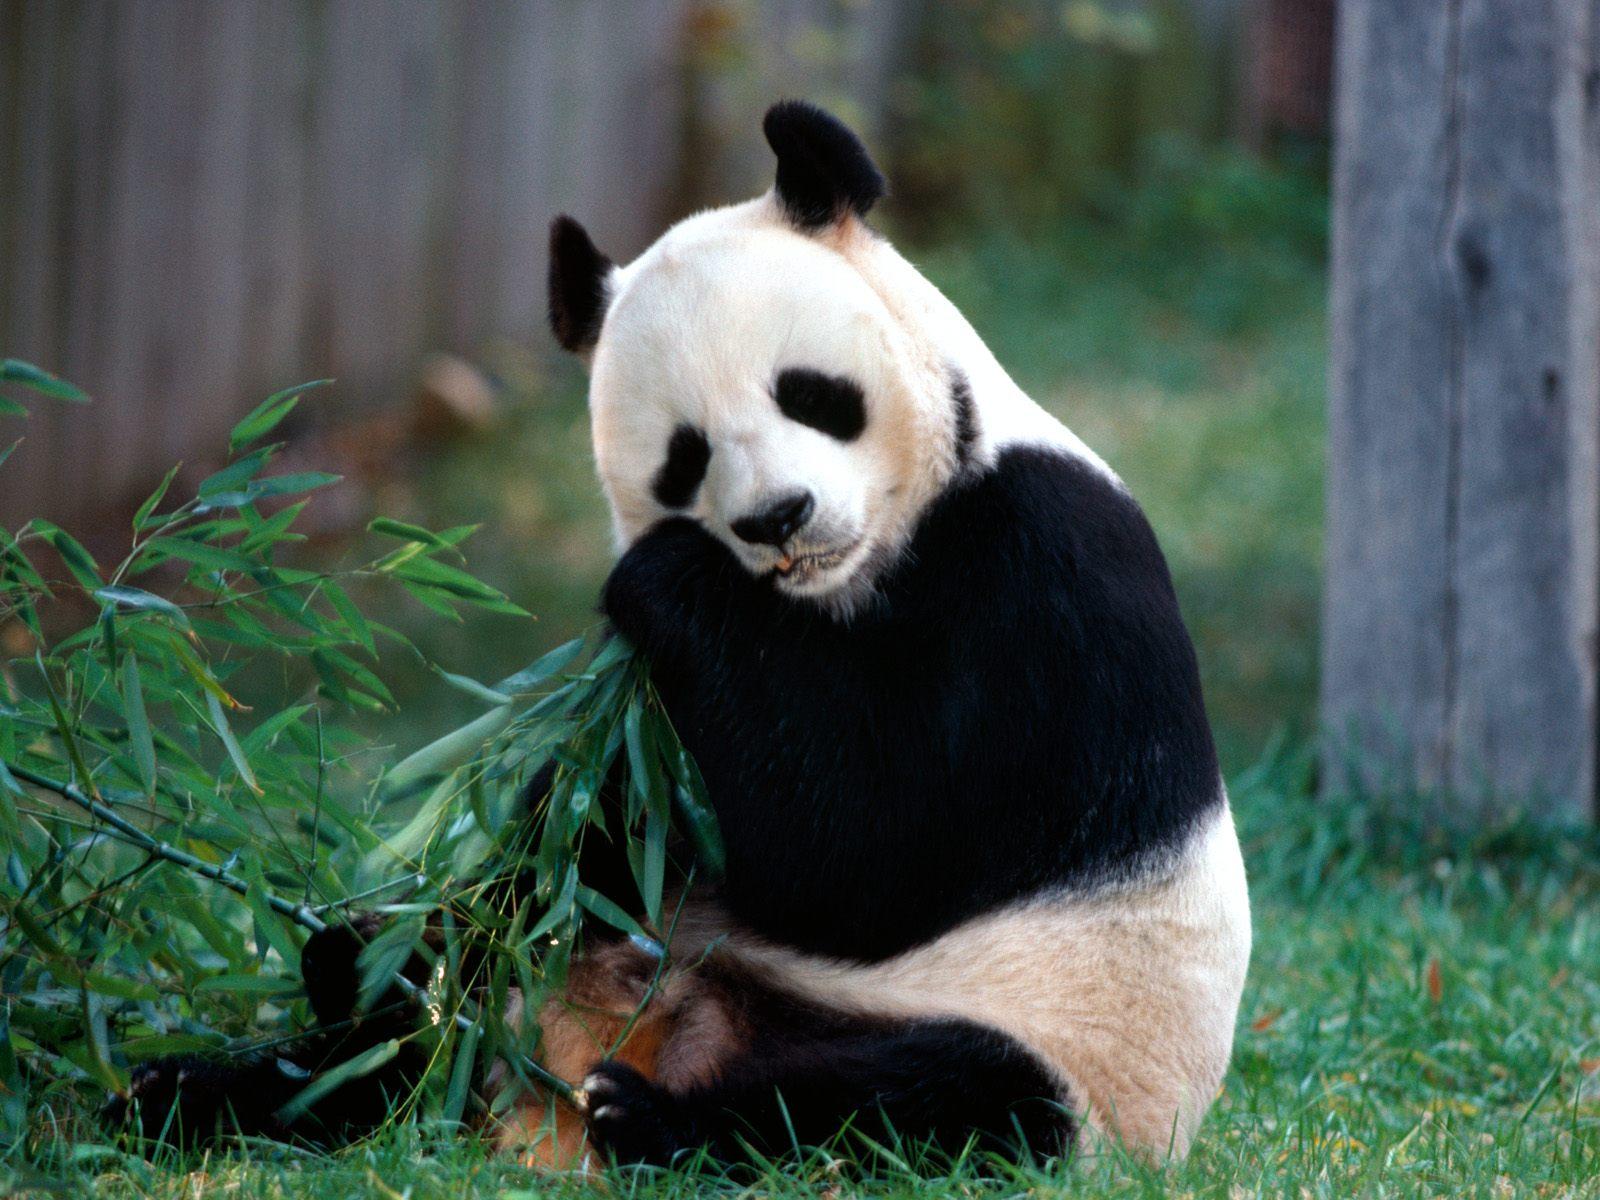 http://www1.jpkabegami.com/images3/wall/20060828/panda004.jpg